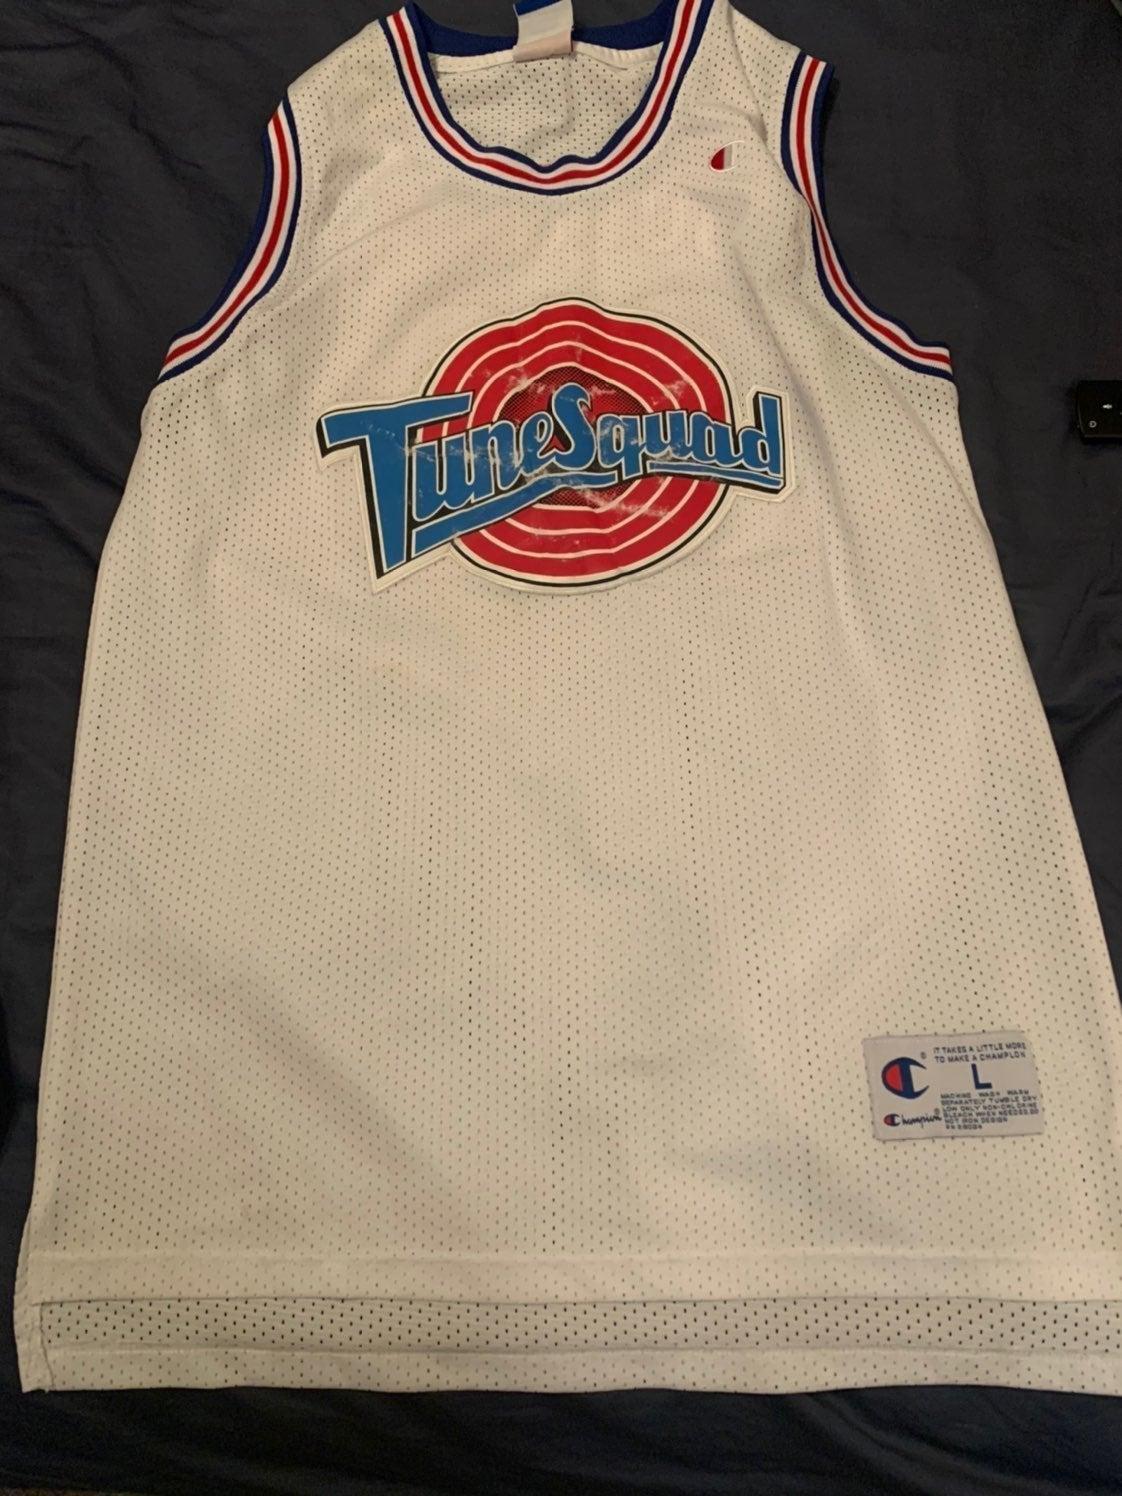 Champion vintage Jordan jersey